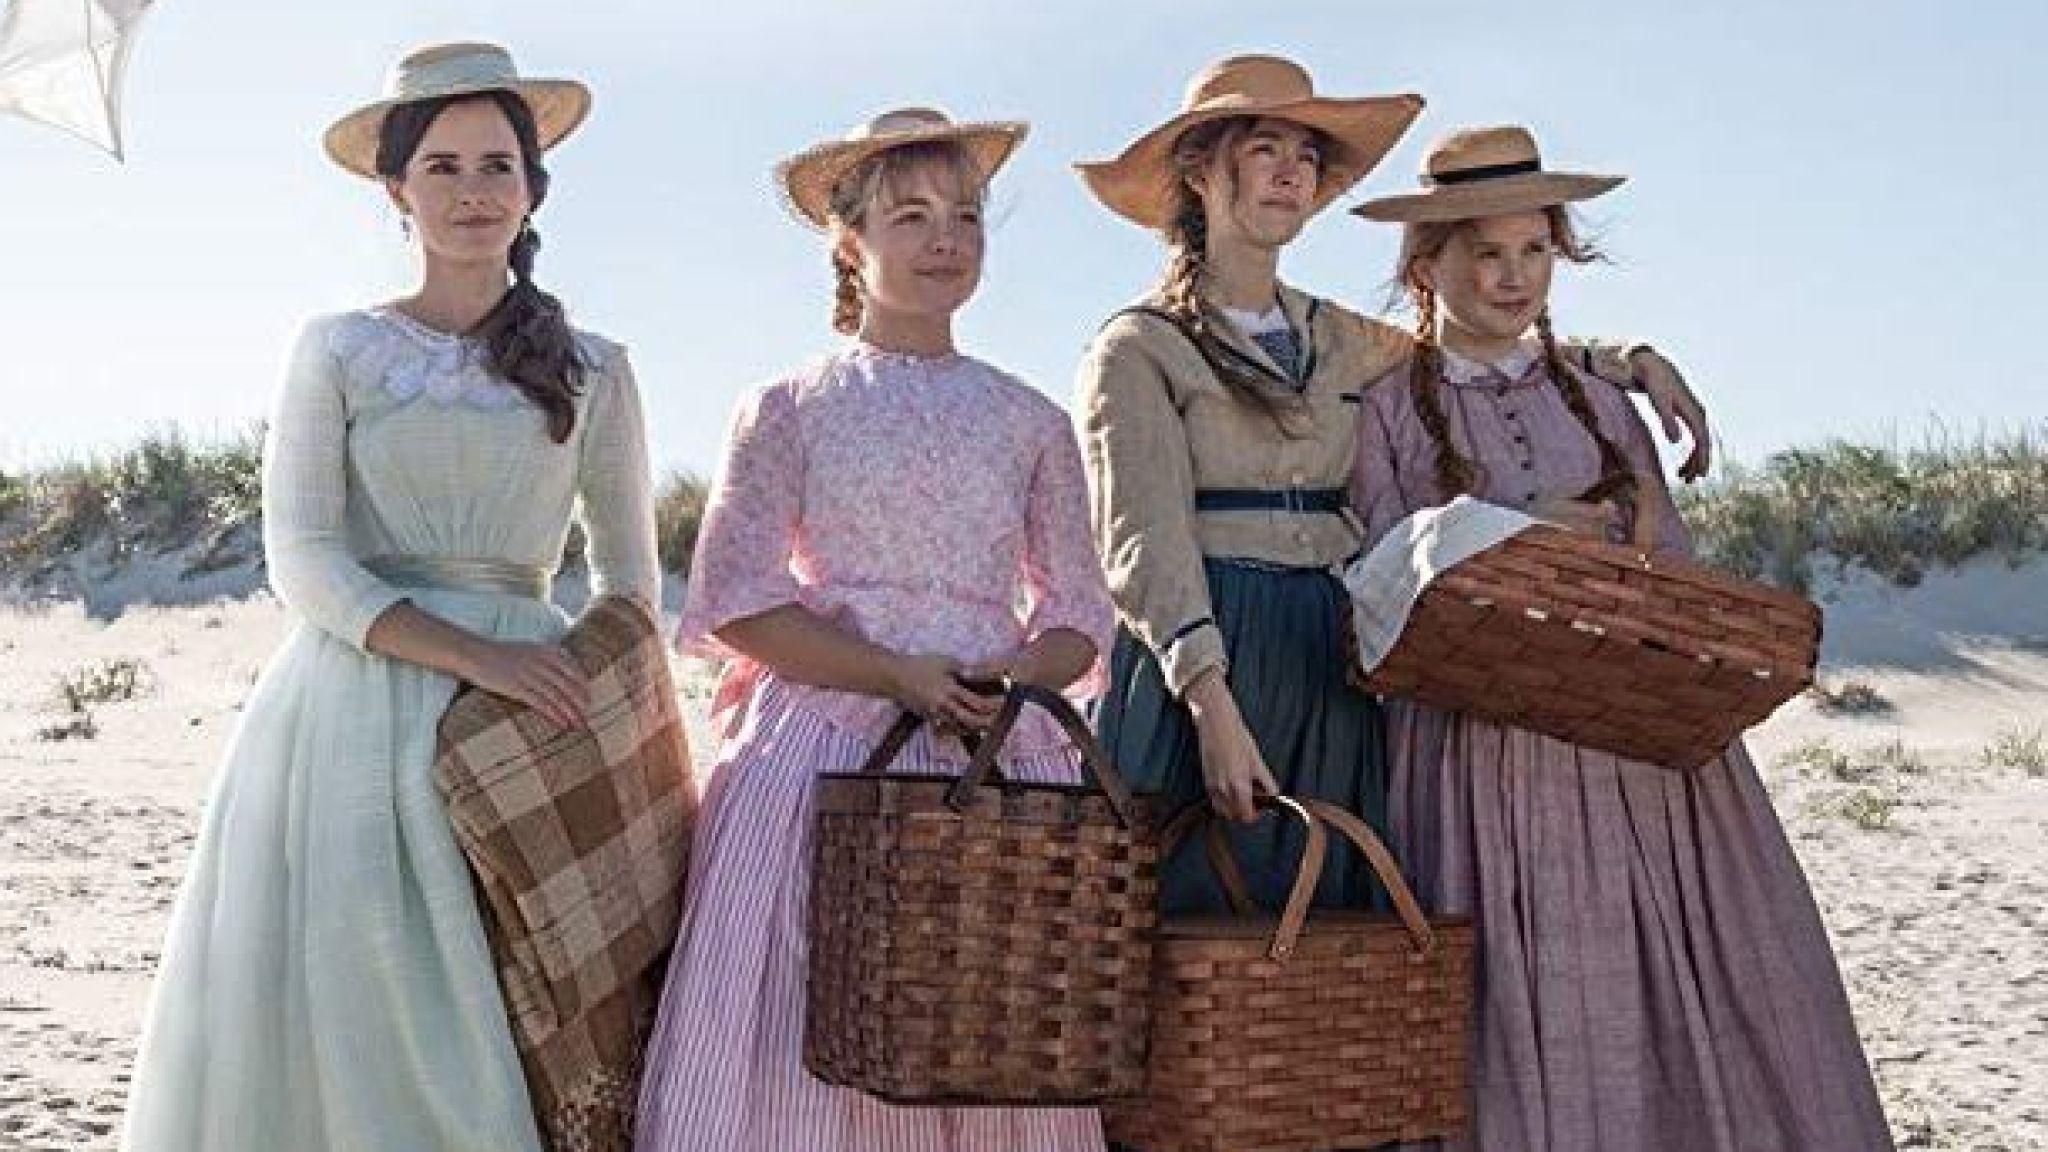 Emma Watson, Florence Pugh, Saoirse Ronan and Eliza Scanlen in Greta Gerwig's Little Women